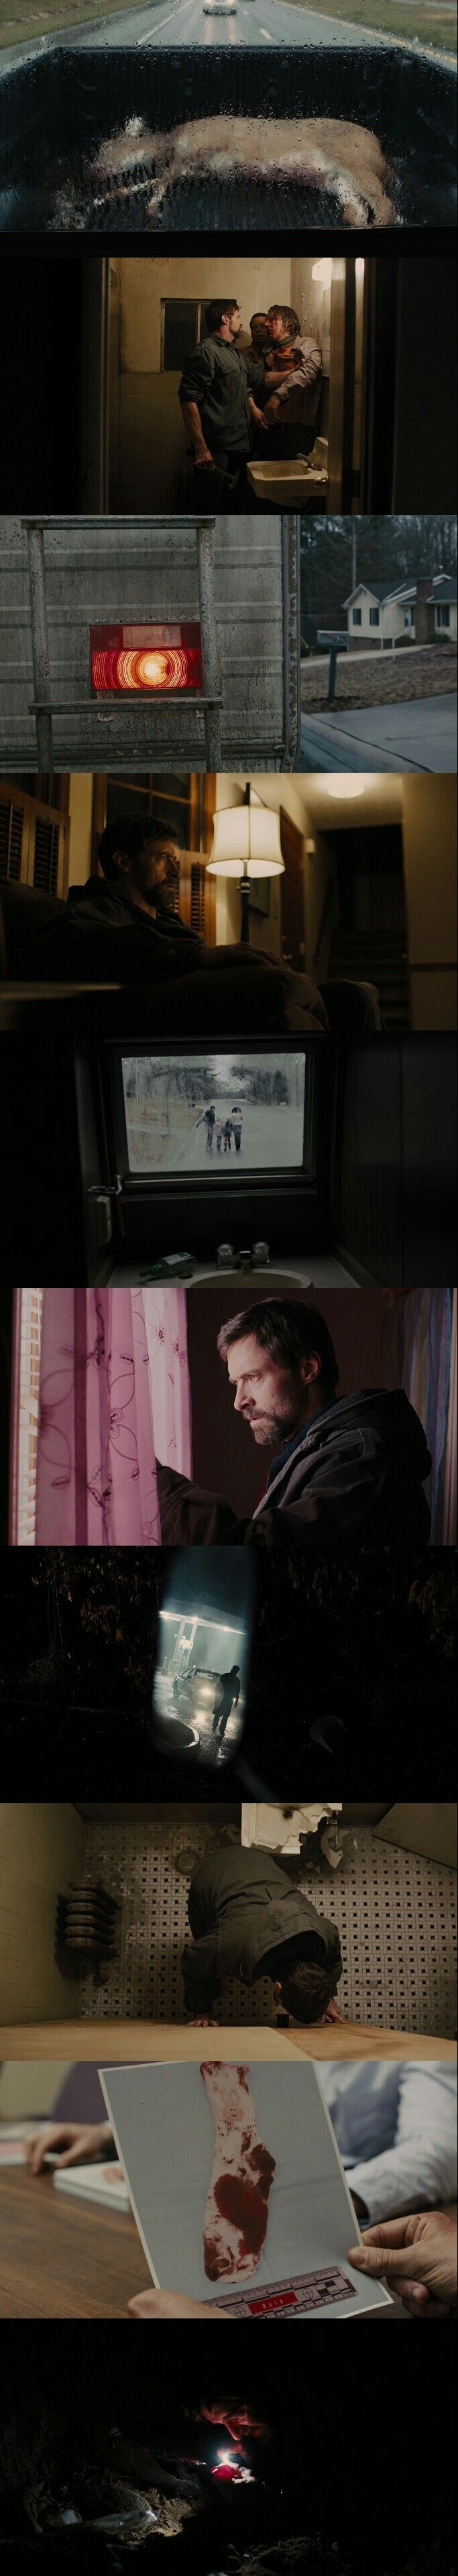 Prisoners(2013) Directed by Denis Villeneuve. Cinematography by Roger A. Deakins. #DigitalFilmSchool